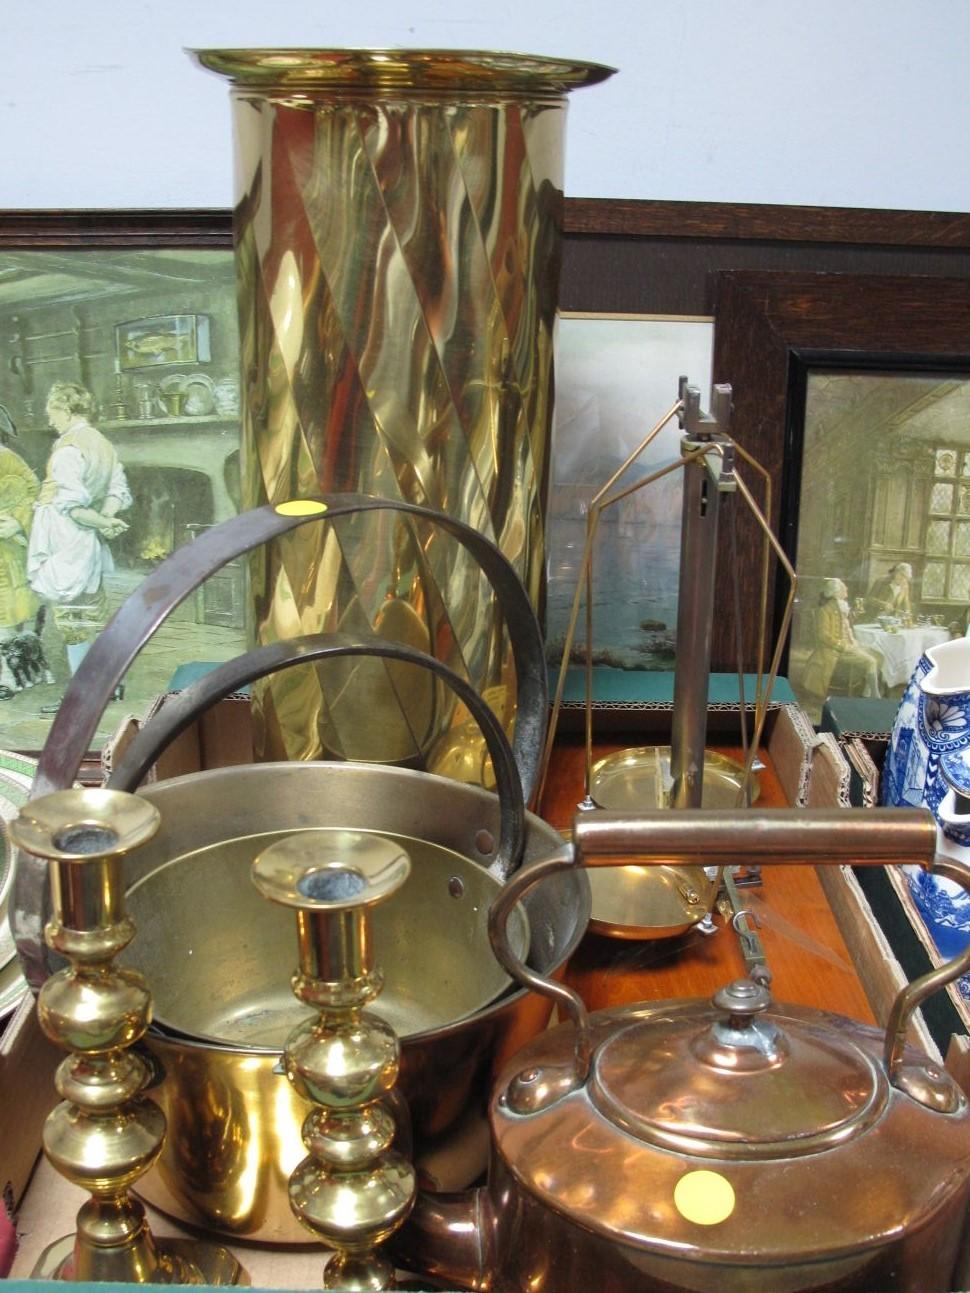 Lot 41 - Philip Harris Balance Scales, copper kettle, brass jam pans, stick stand, candlesticks:- One Box